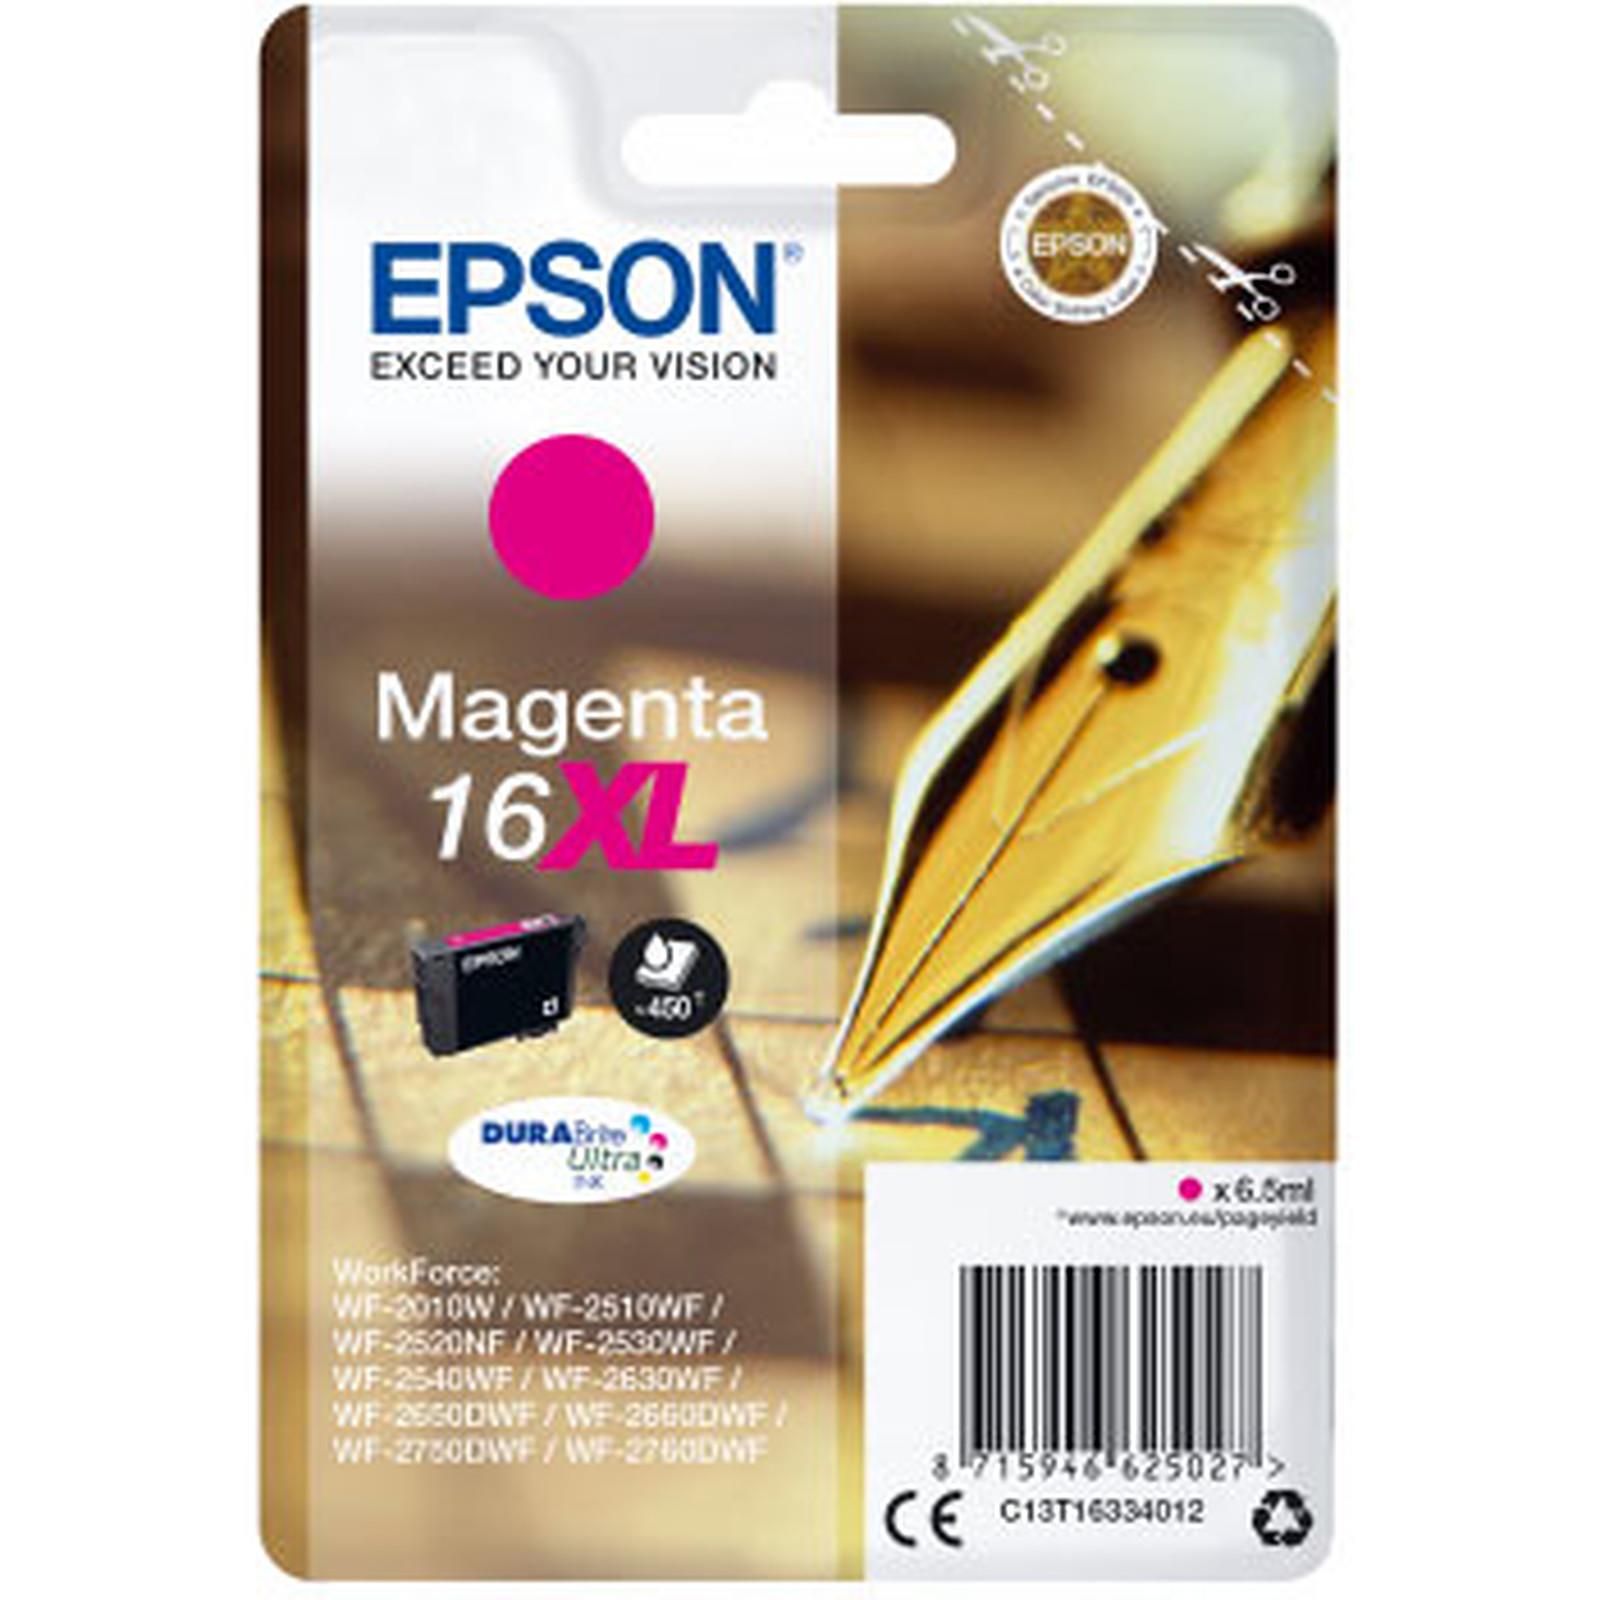 Epson Stylo à Plume 16 XL Magenta